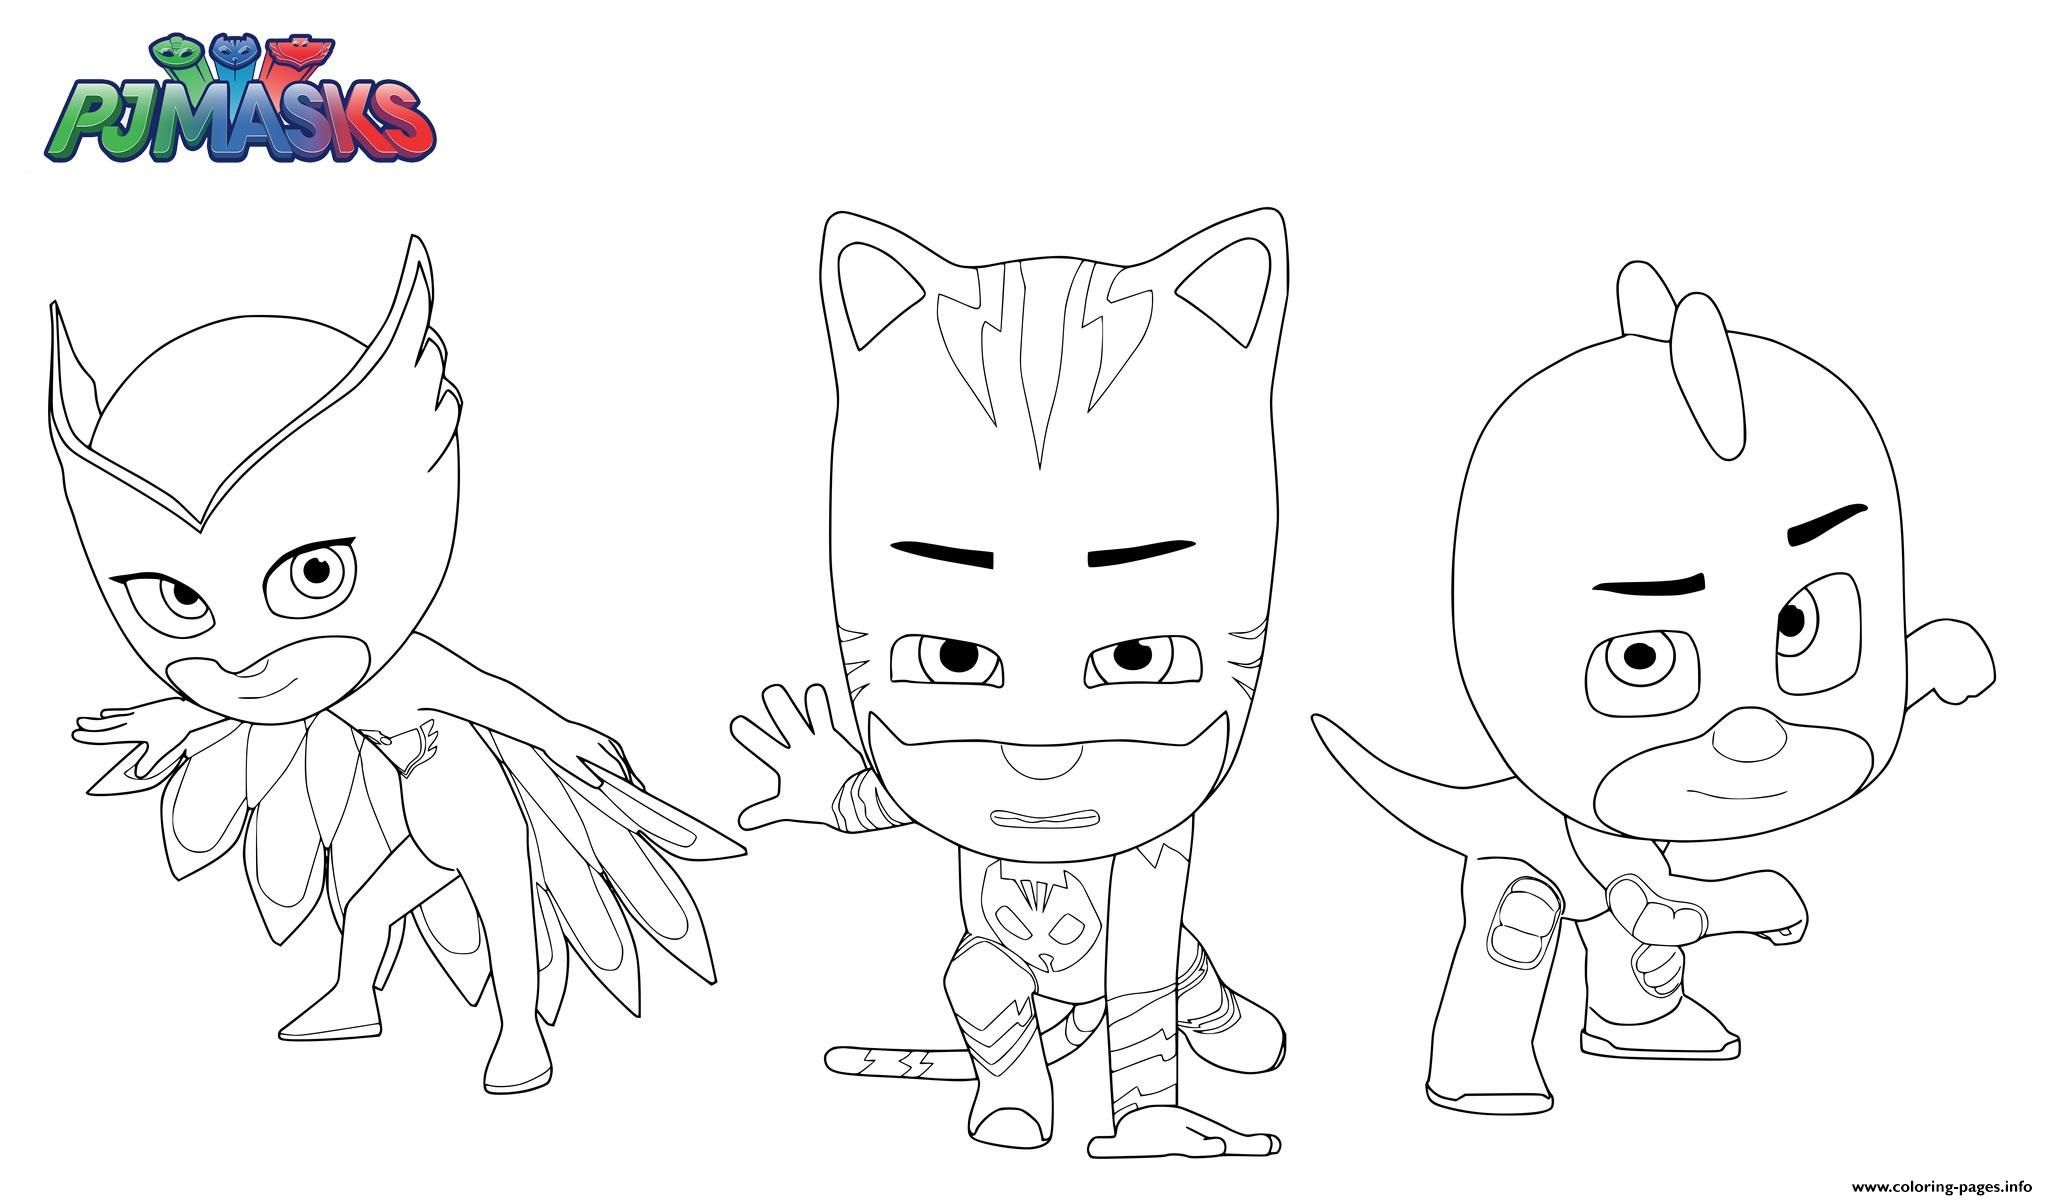 Print PJ Masks Superheroes Coloring Pages